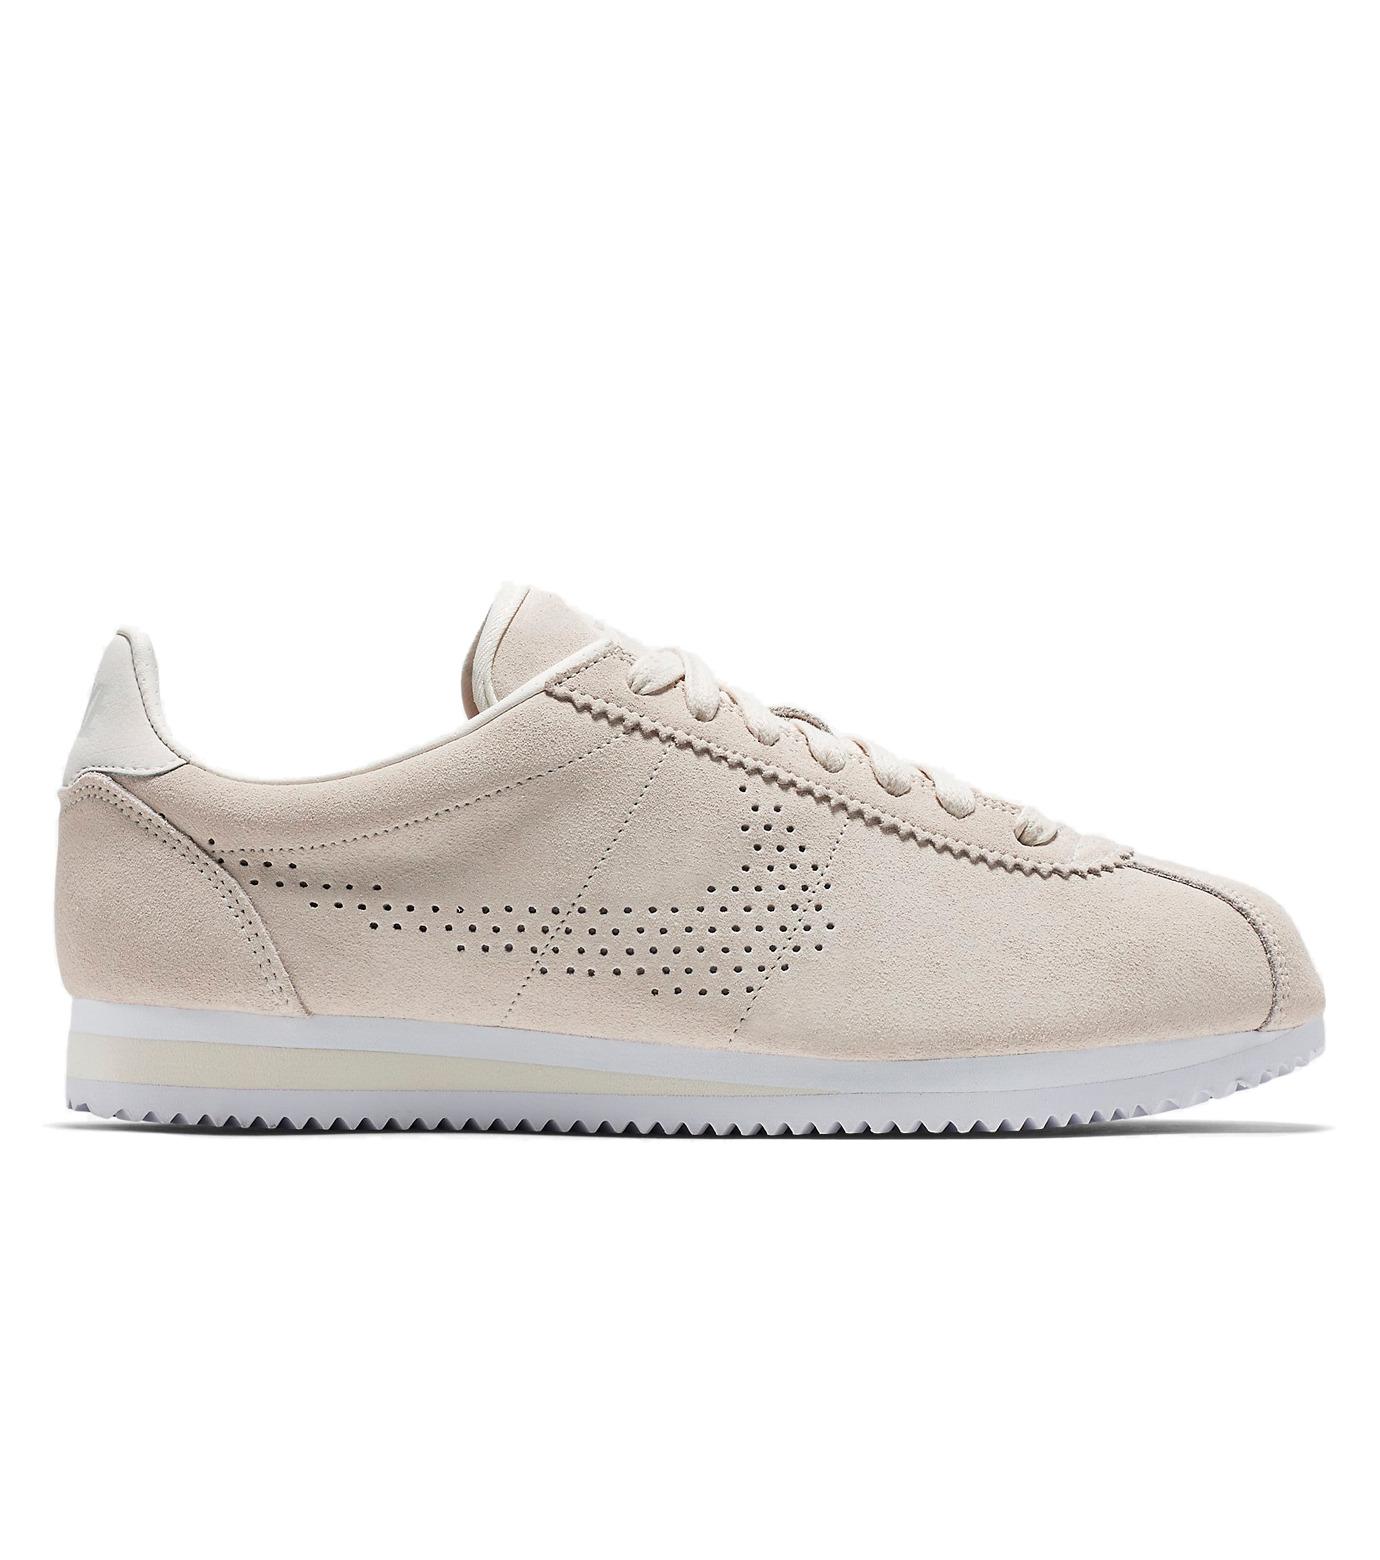 NIKE(ナイキ)のCLASSIC CORTEZ LX-BEIGE(シューズ/shoes)-823914-055-52 拡大詳細画像1